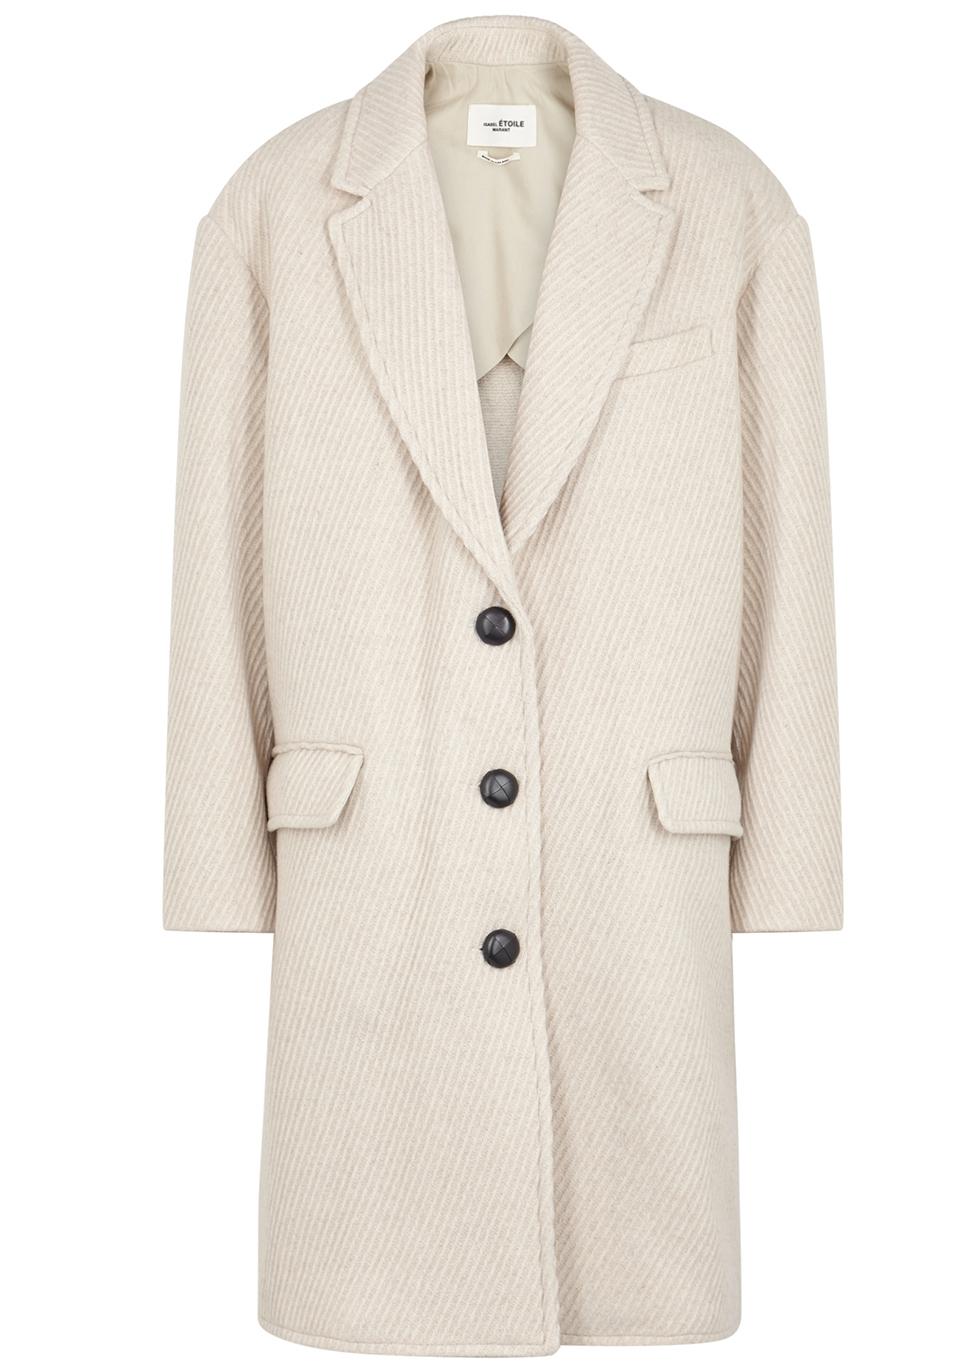 Gimi off-white wool-blend coat - Isabel Marant Étoile